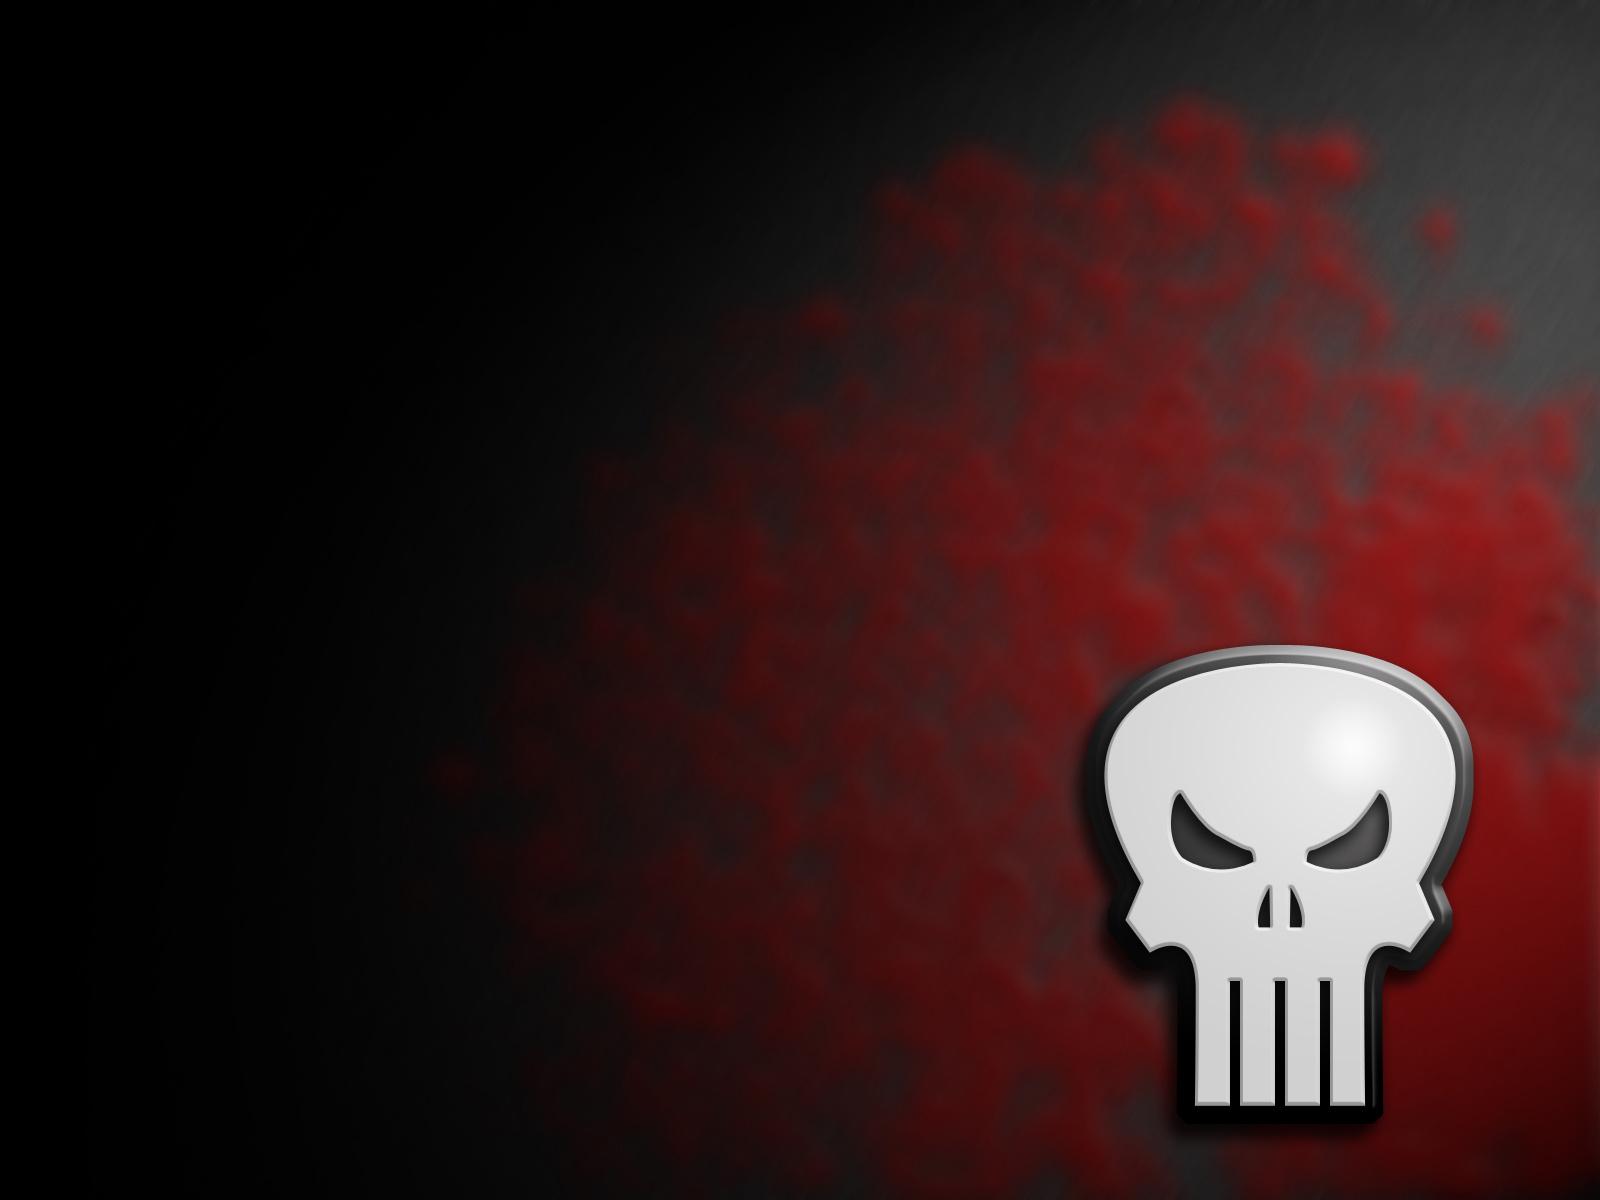 Punisher Superhero Symbol